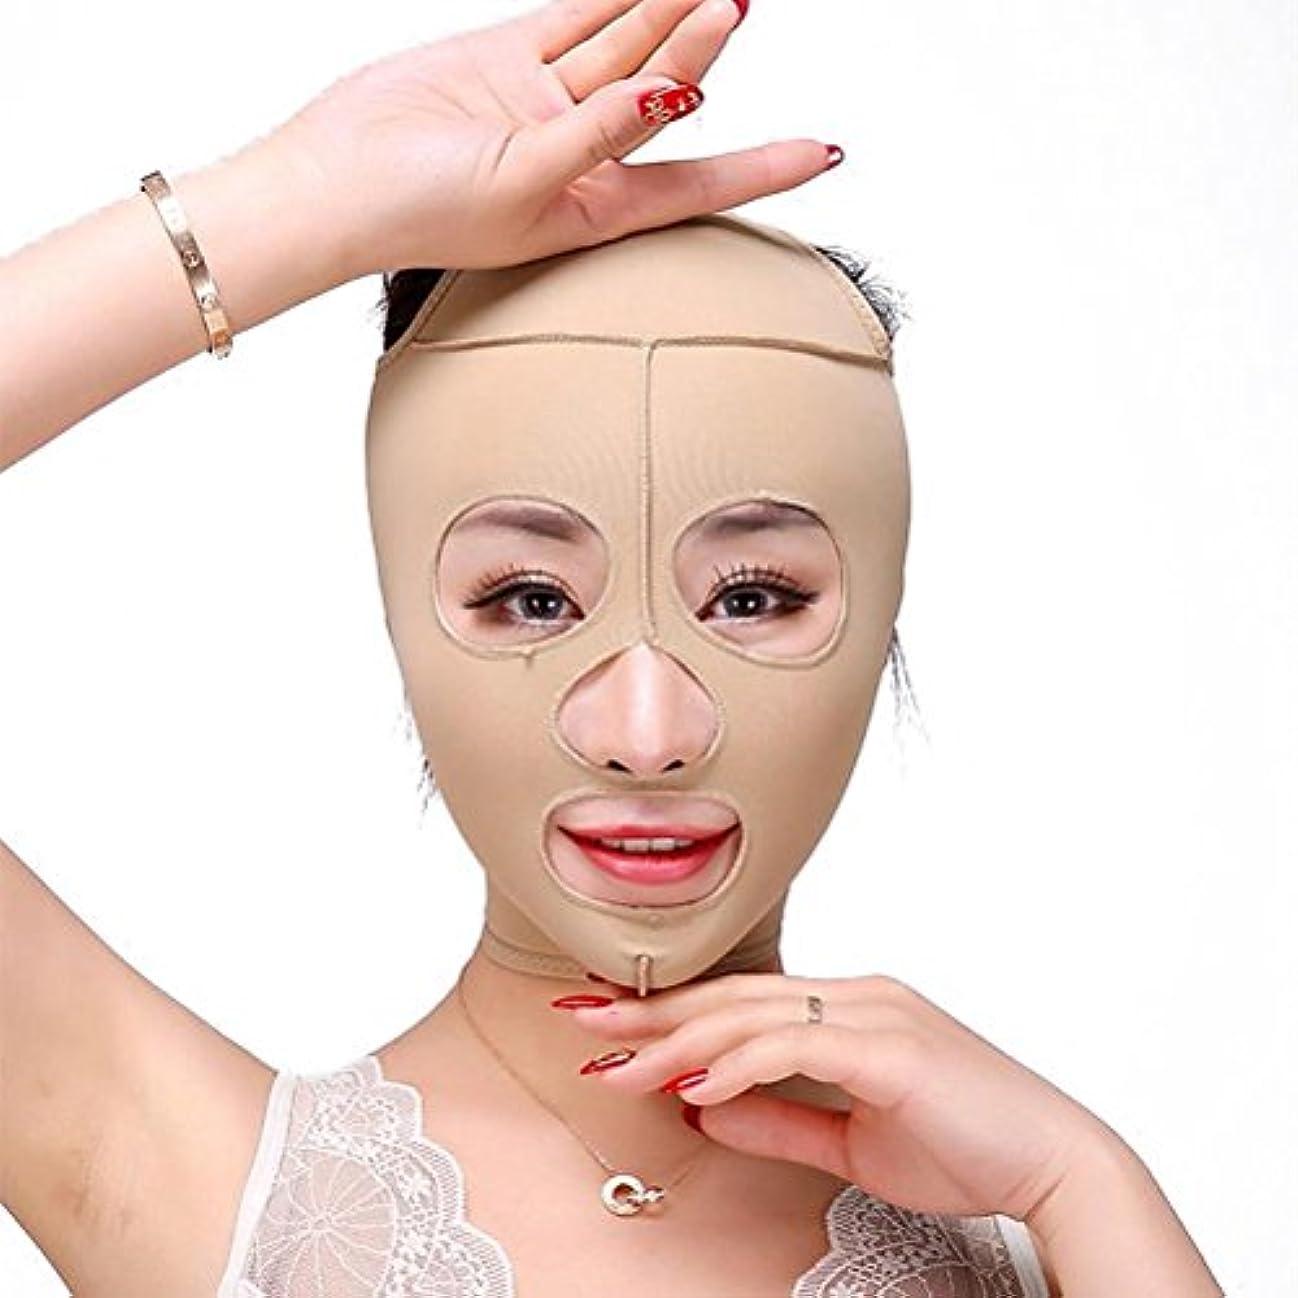 Beaupretty スリムフェイスマスク弾性肌色包帯リフトアップチン痩身Vフェイスシェイパー